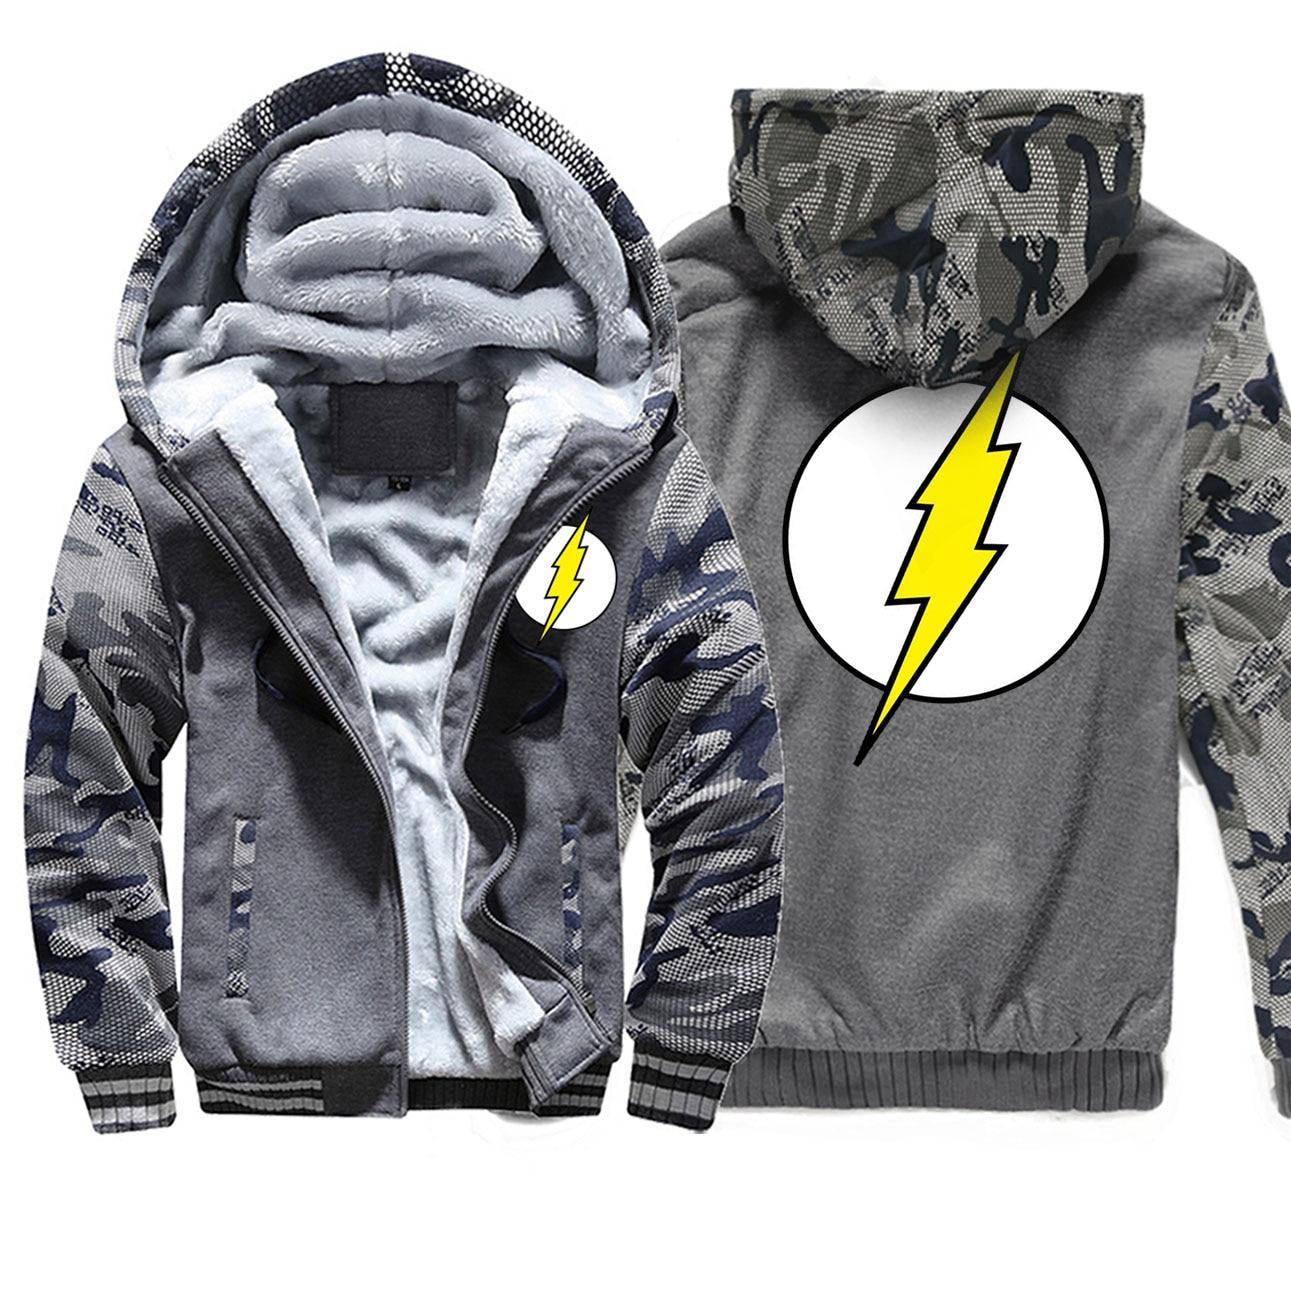 The Big Bang Sheldon The Flash Men Hoodies Camo Bodywarmer Fleece Long Sleeve Mens Sweatshirts 2019 Autumn Winter Jackets